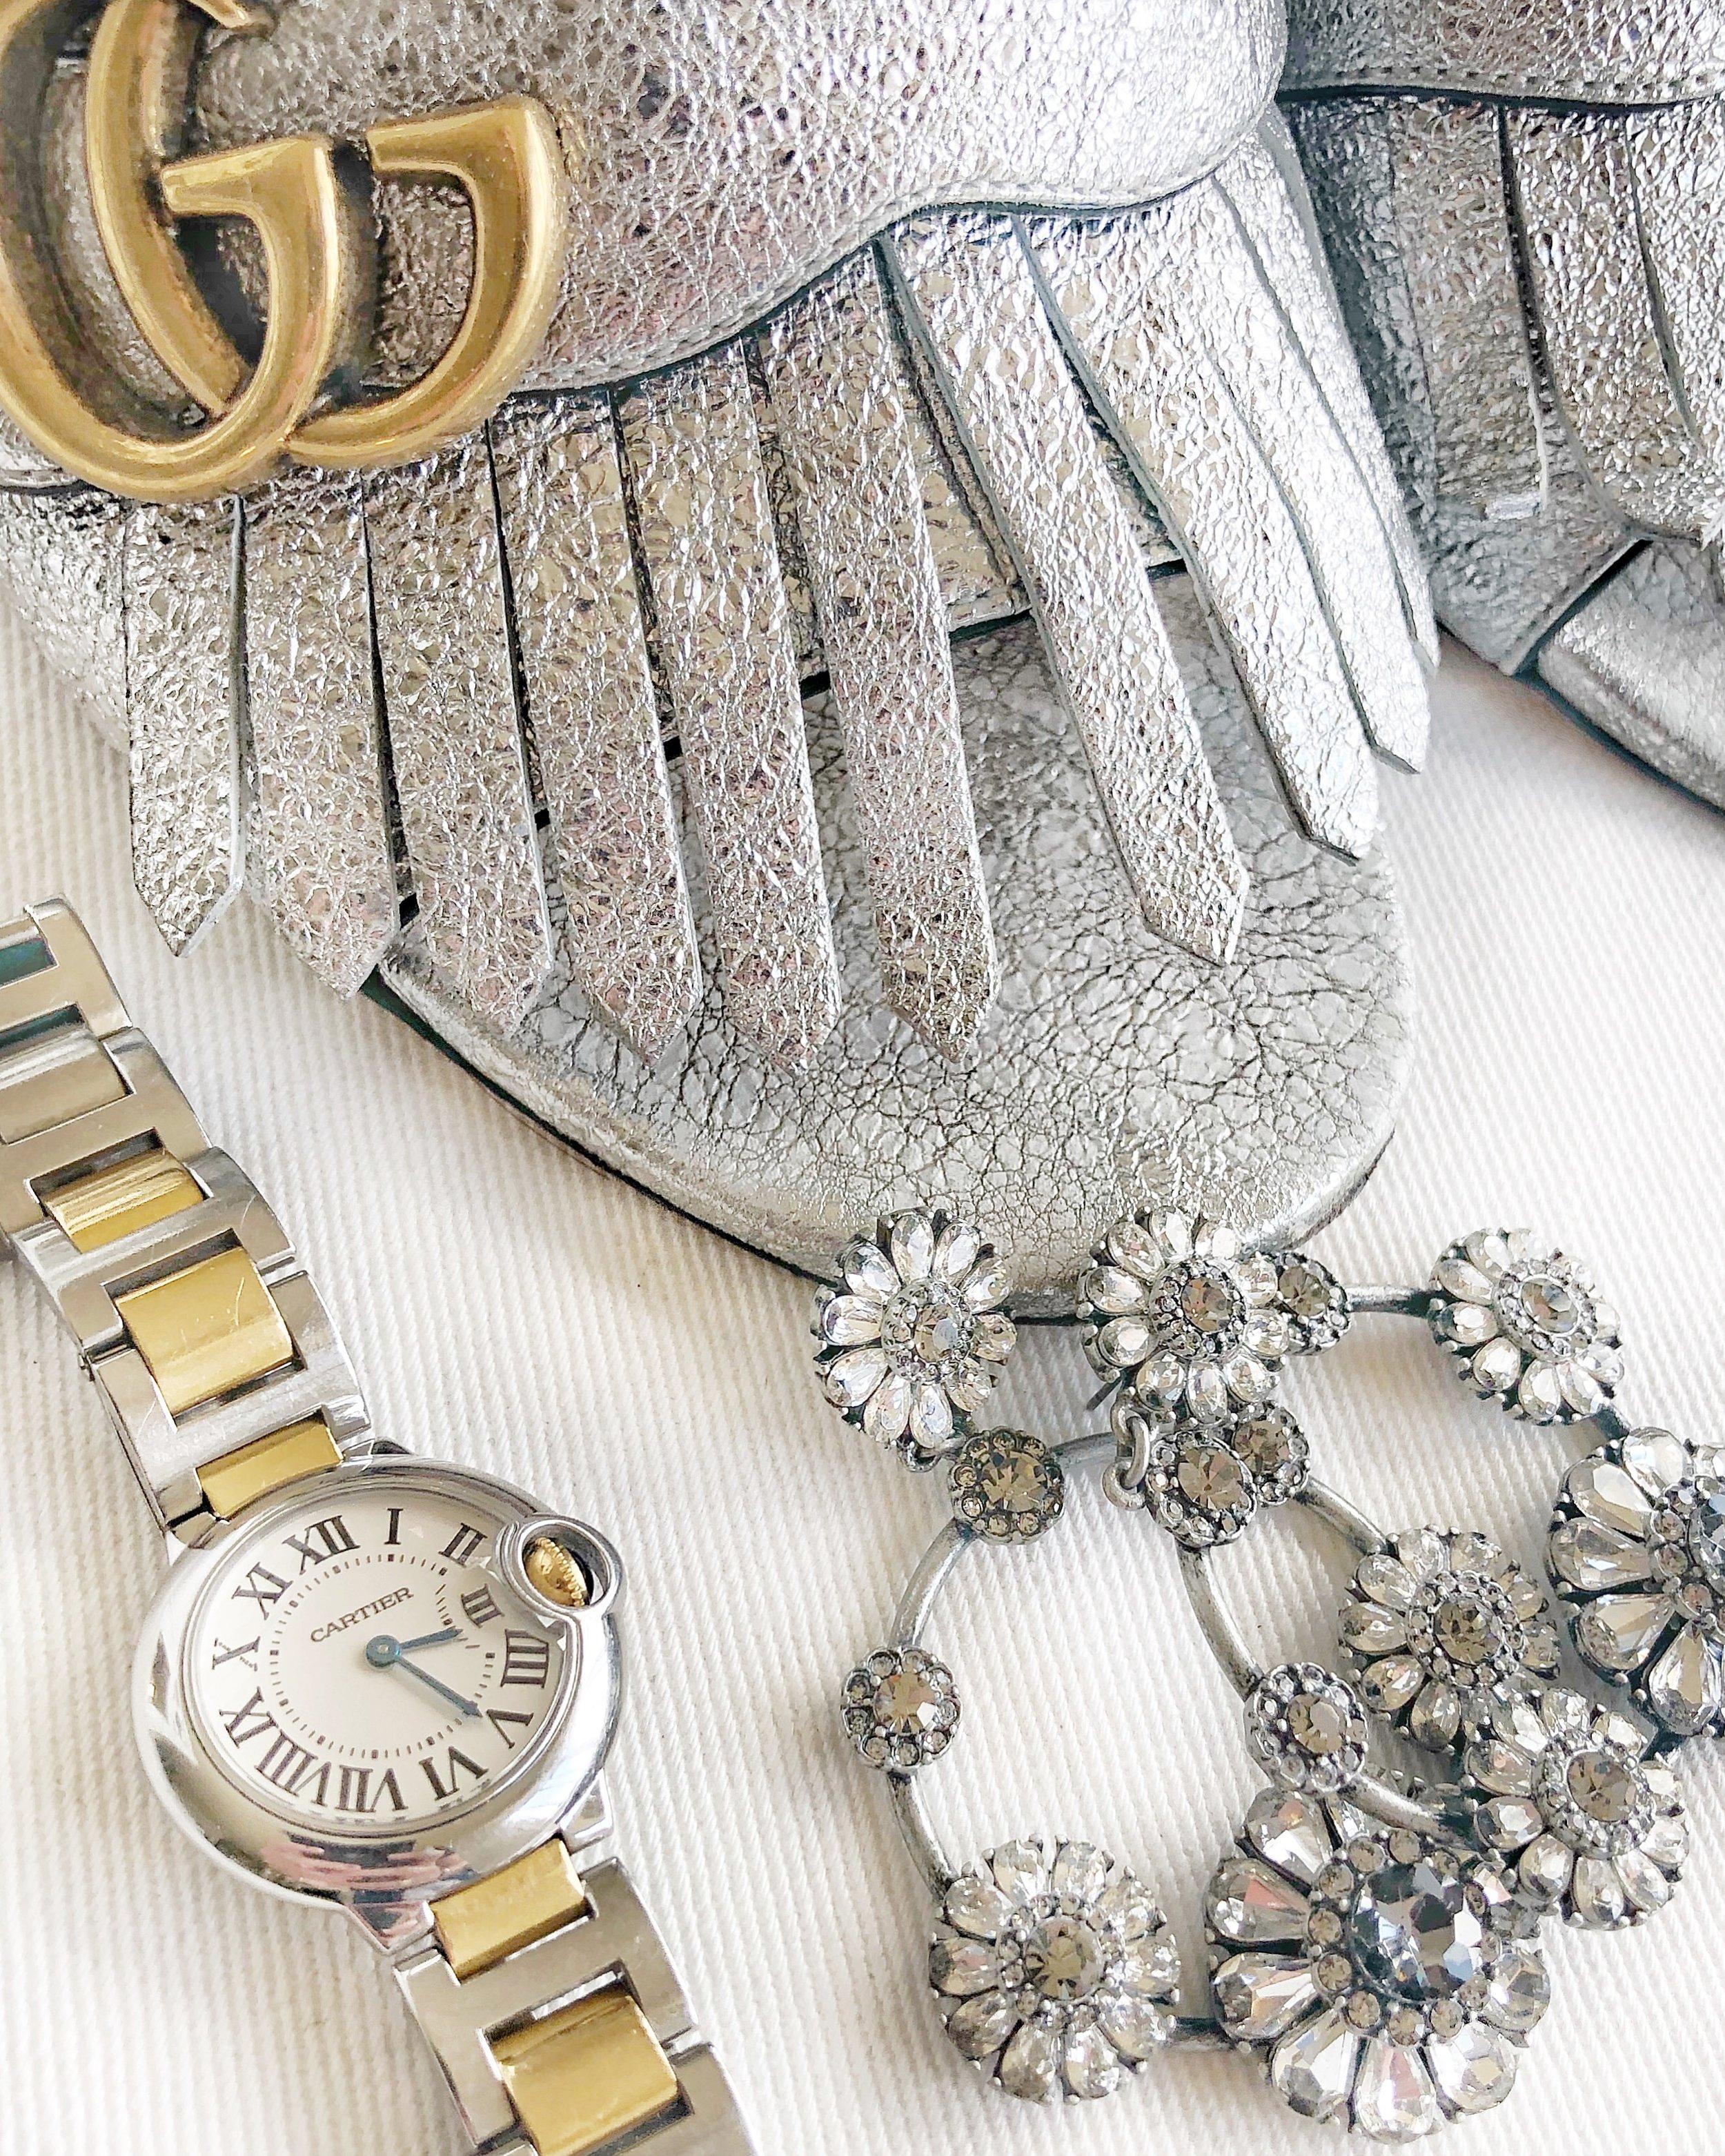 Gucci Marmont Silver Heels Cartier Ballon Bleu and Sparkle Earrings